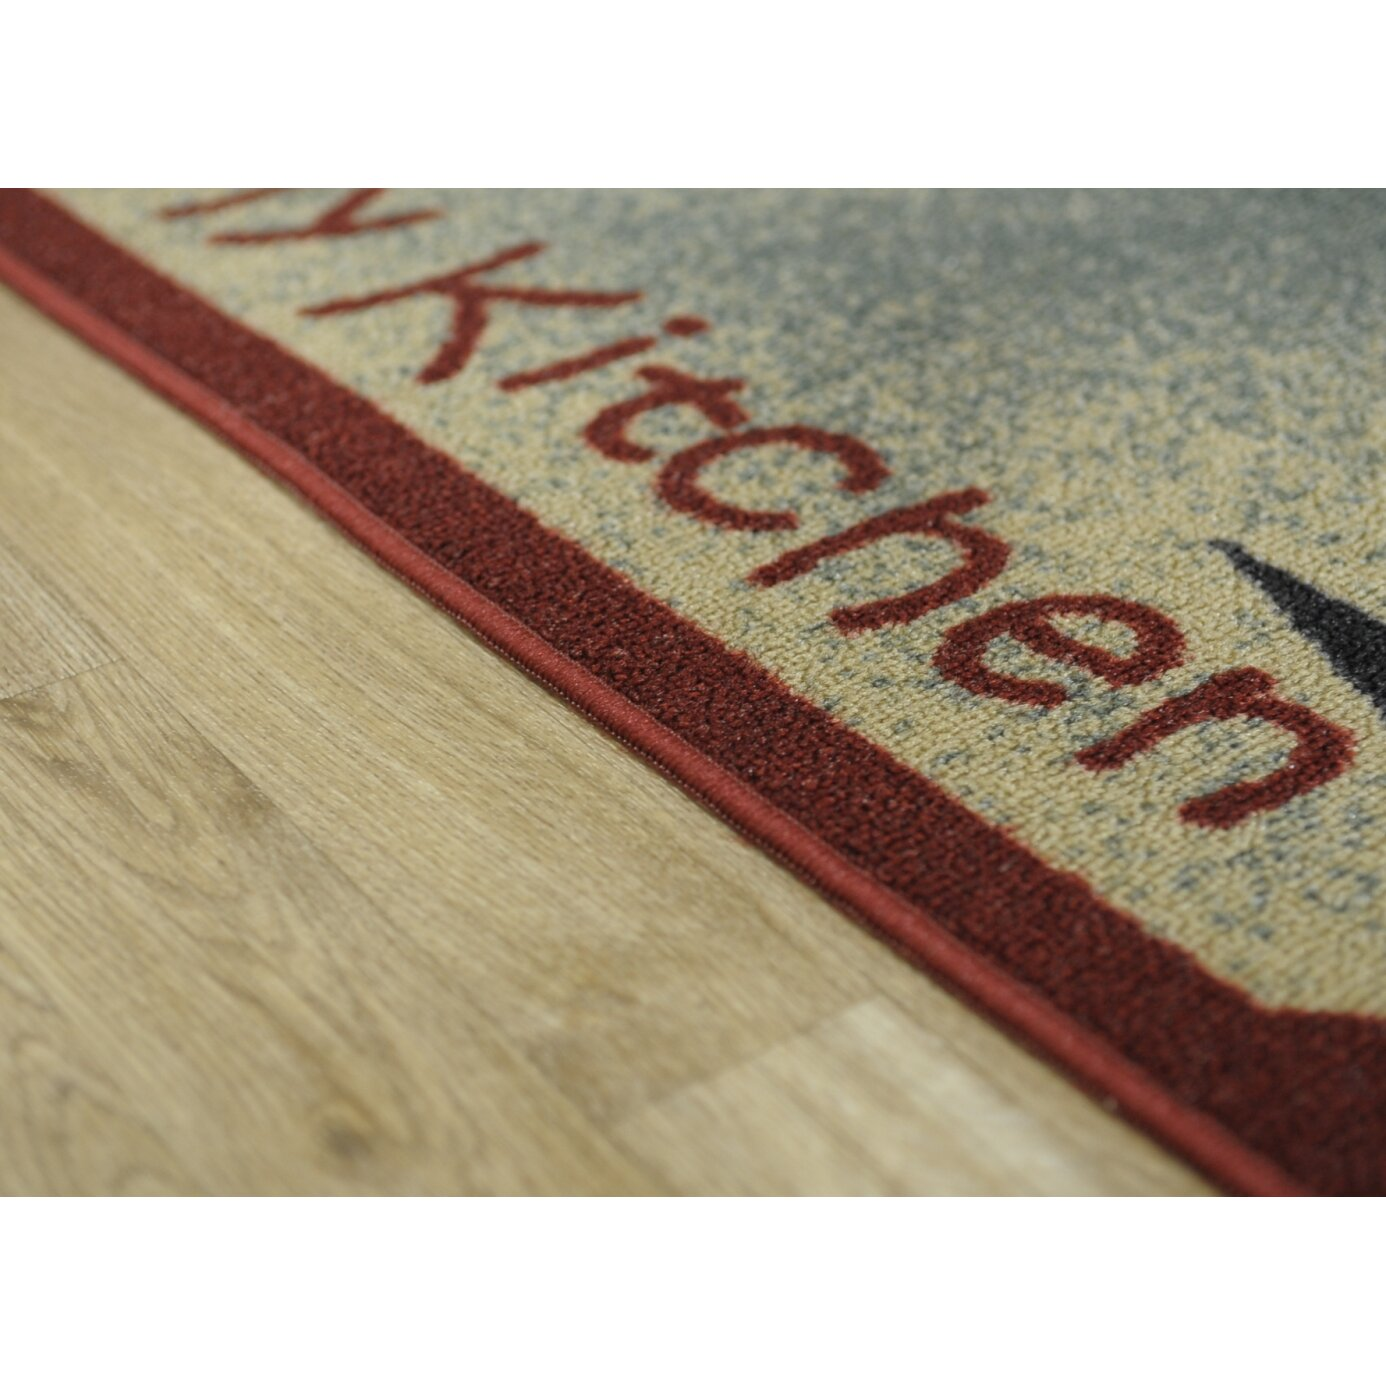 Red Kitchen Rugs And Mats Rugnur Cucina I Love My Kitchen And Utensils Cream Red Kitchen